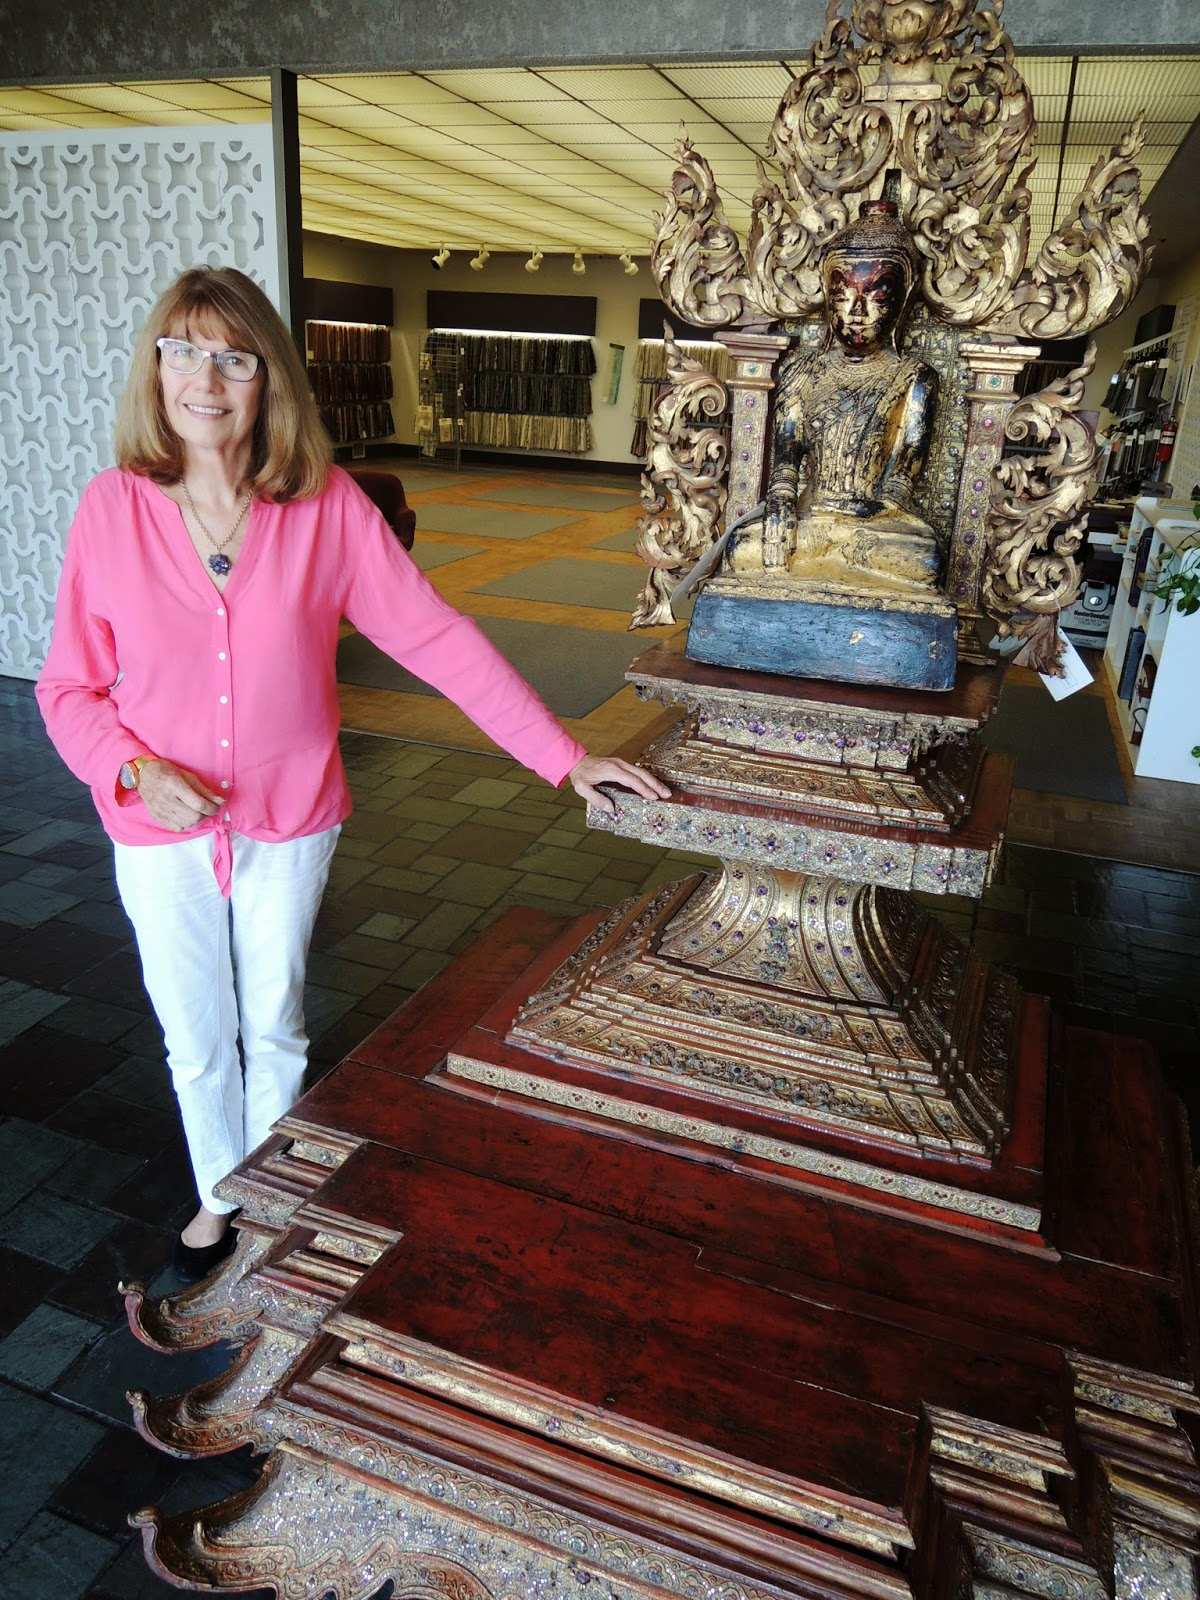 Marla Gentry, Buddha altar, Burma, Chiang Mai, Victoria and Albert Museaum, Lonton, Doris Duke